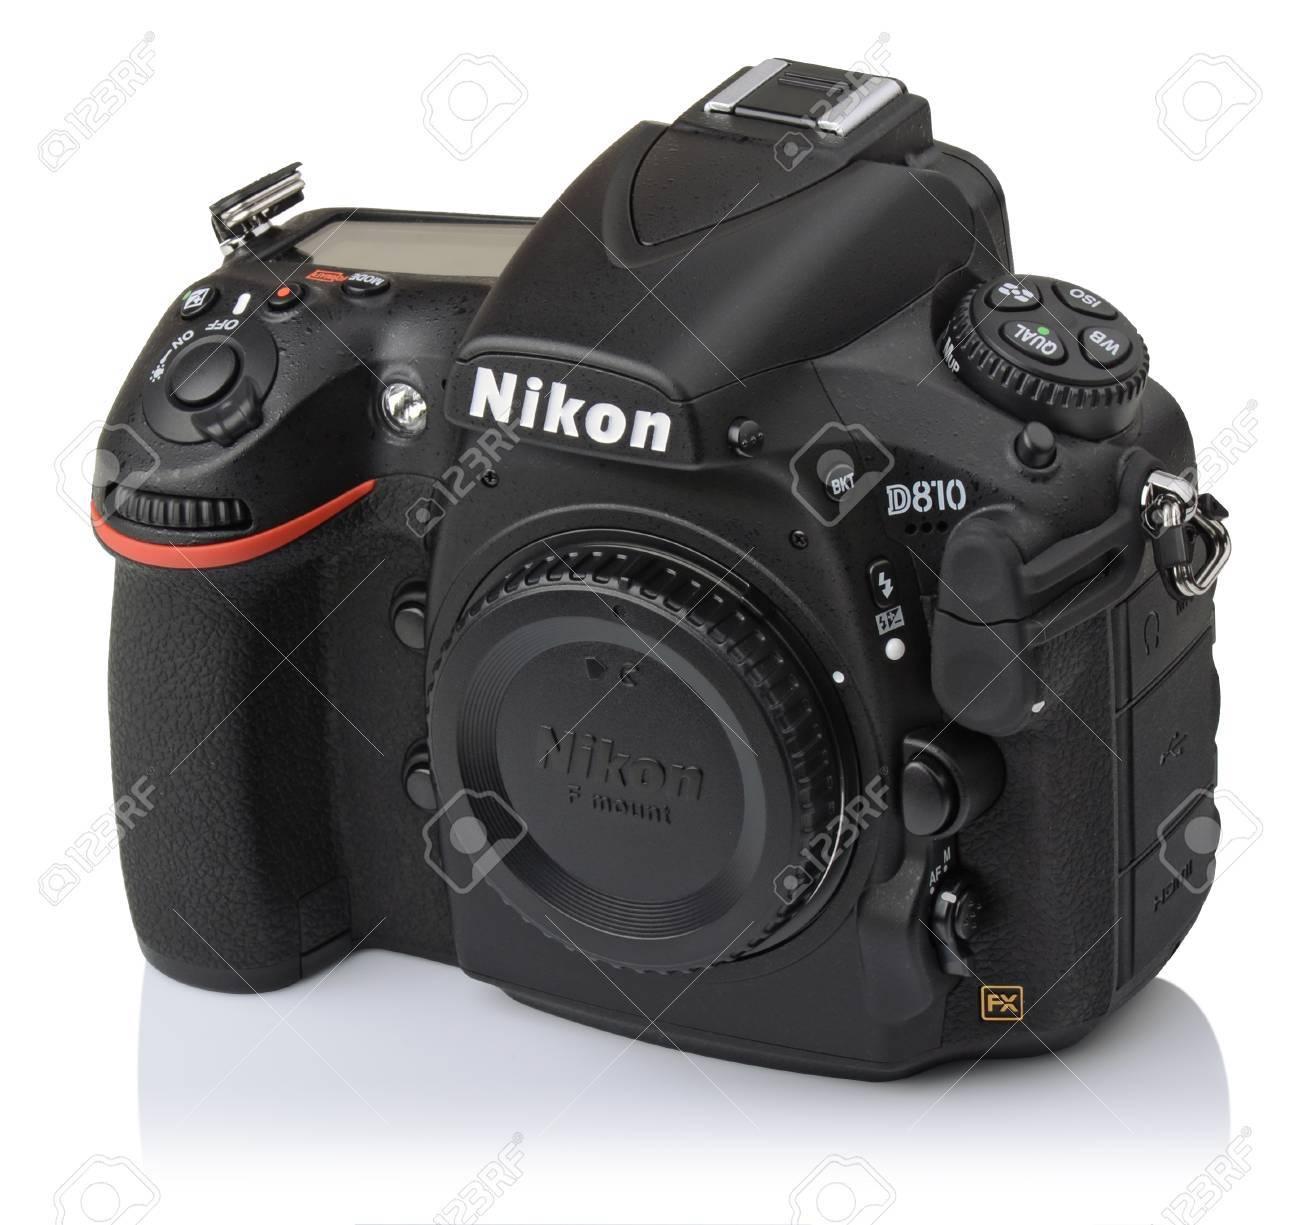 camera body nikon d810 the first digital slr camera in nikon stock